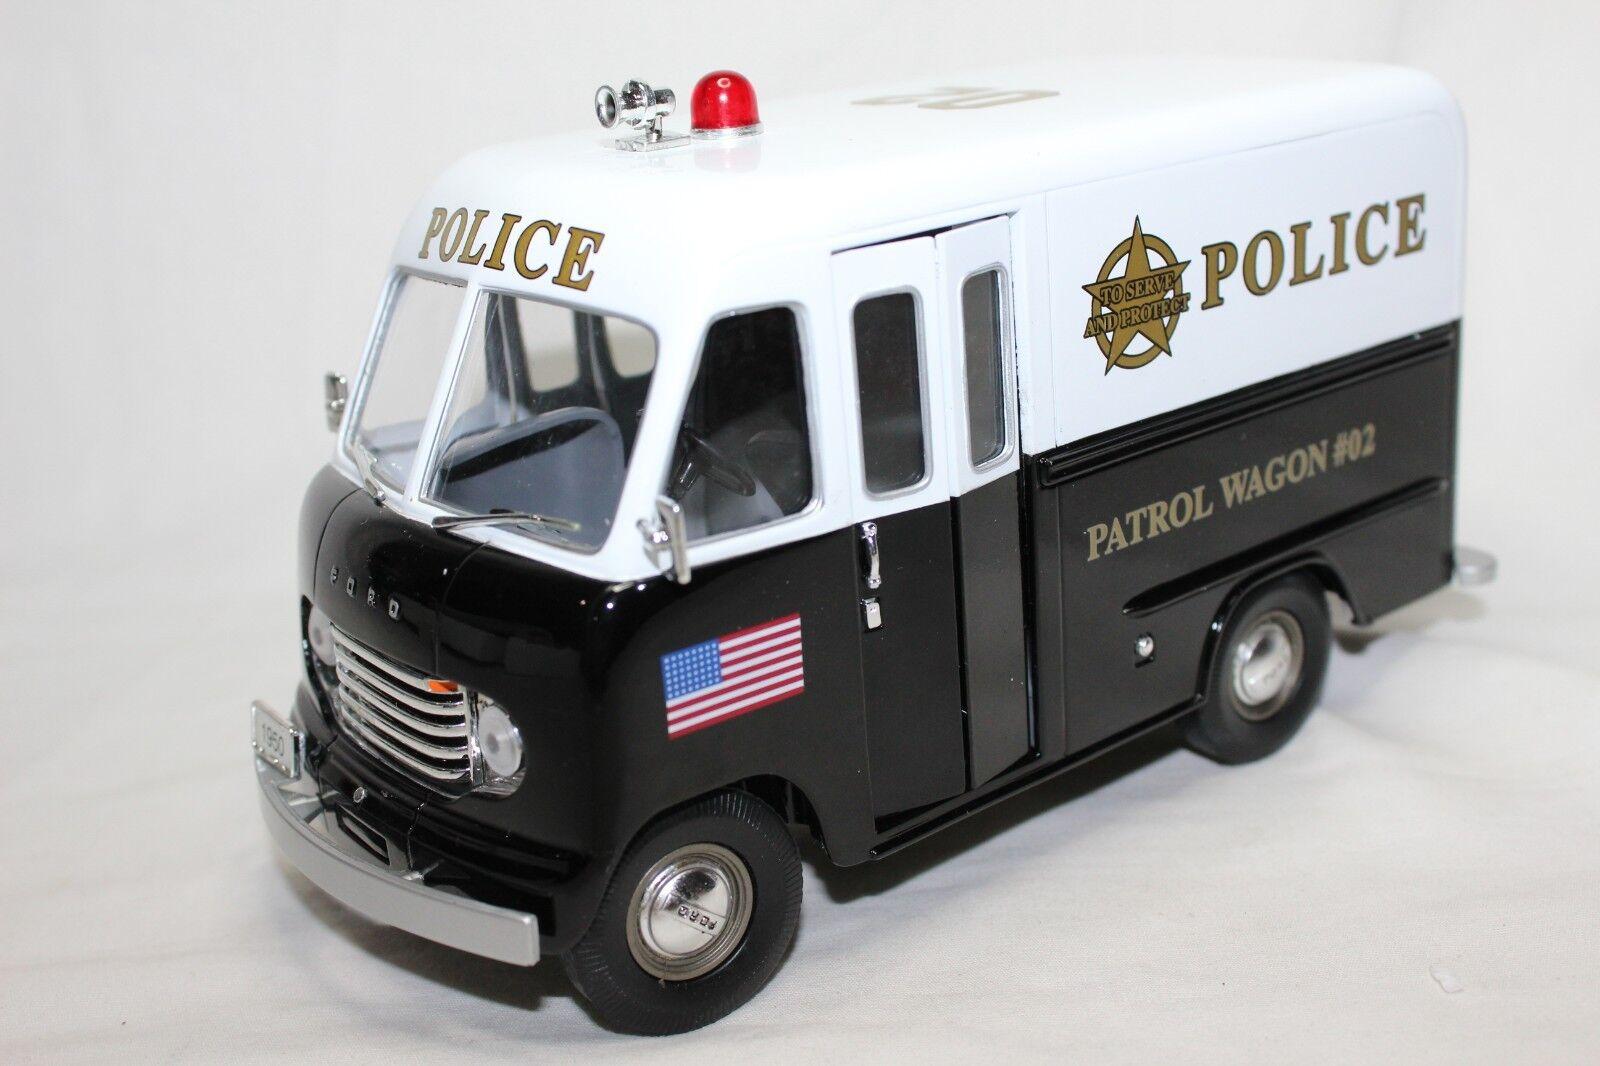 Einzigartige repliken 24 skala 1950 schritt van polizeistreife wagen   02